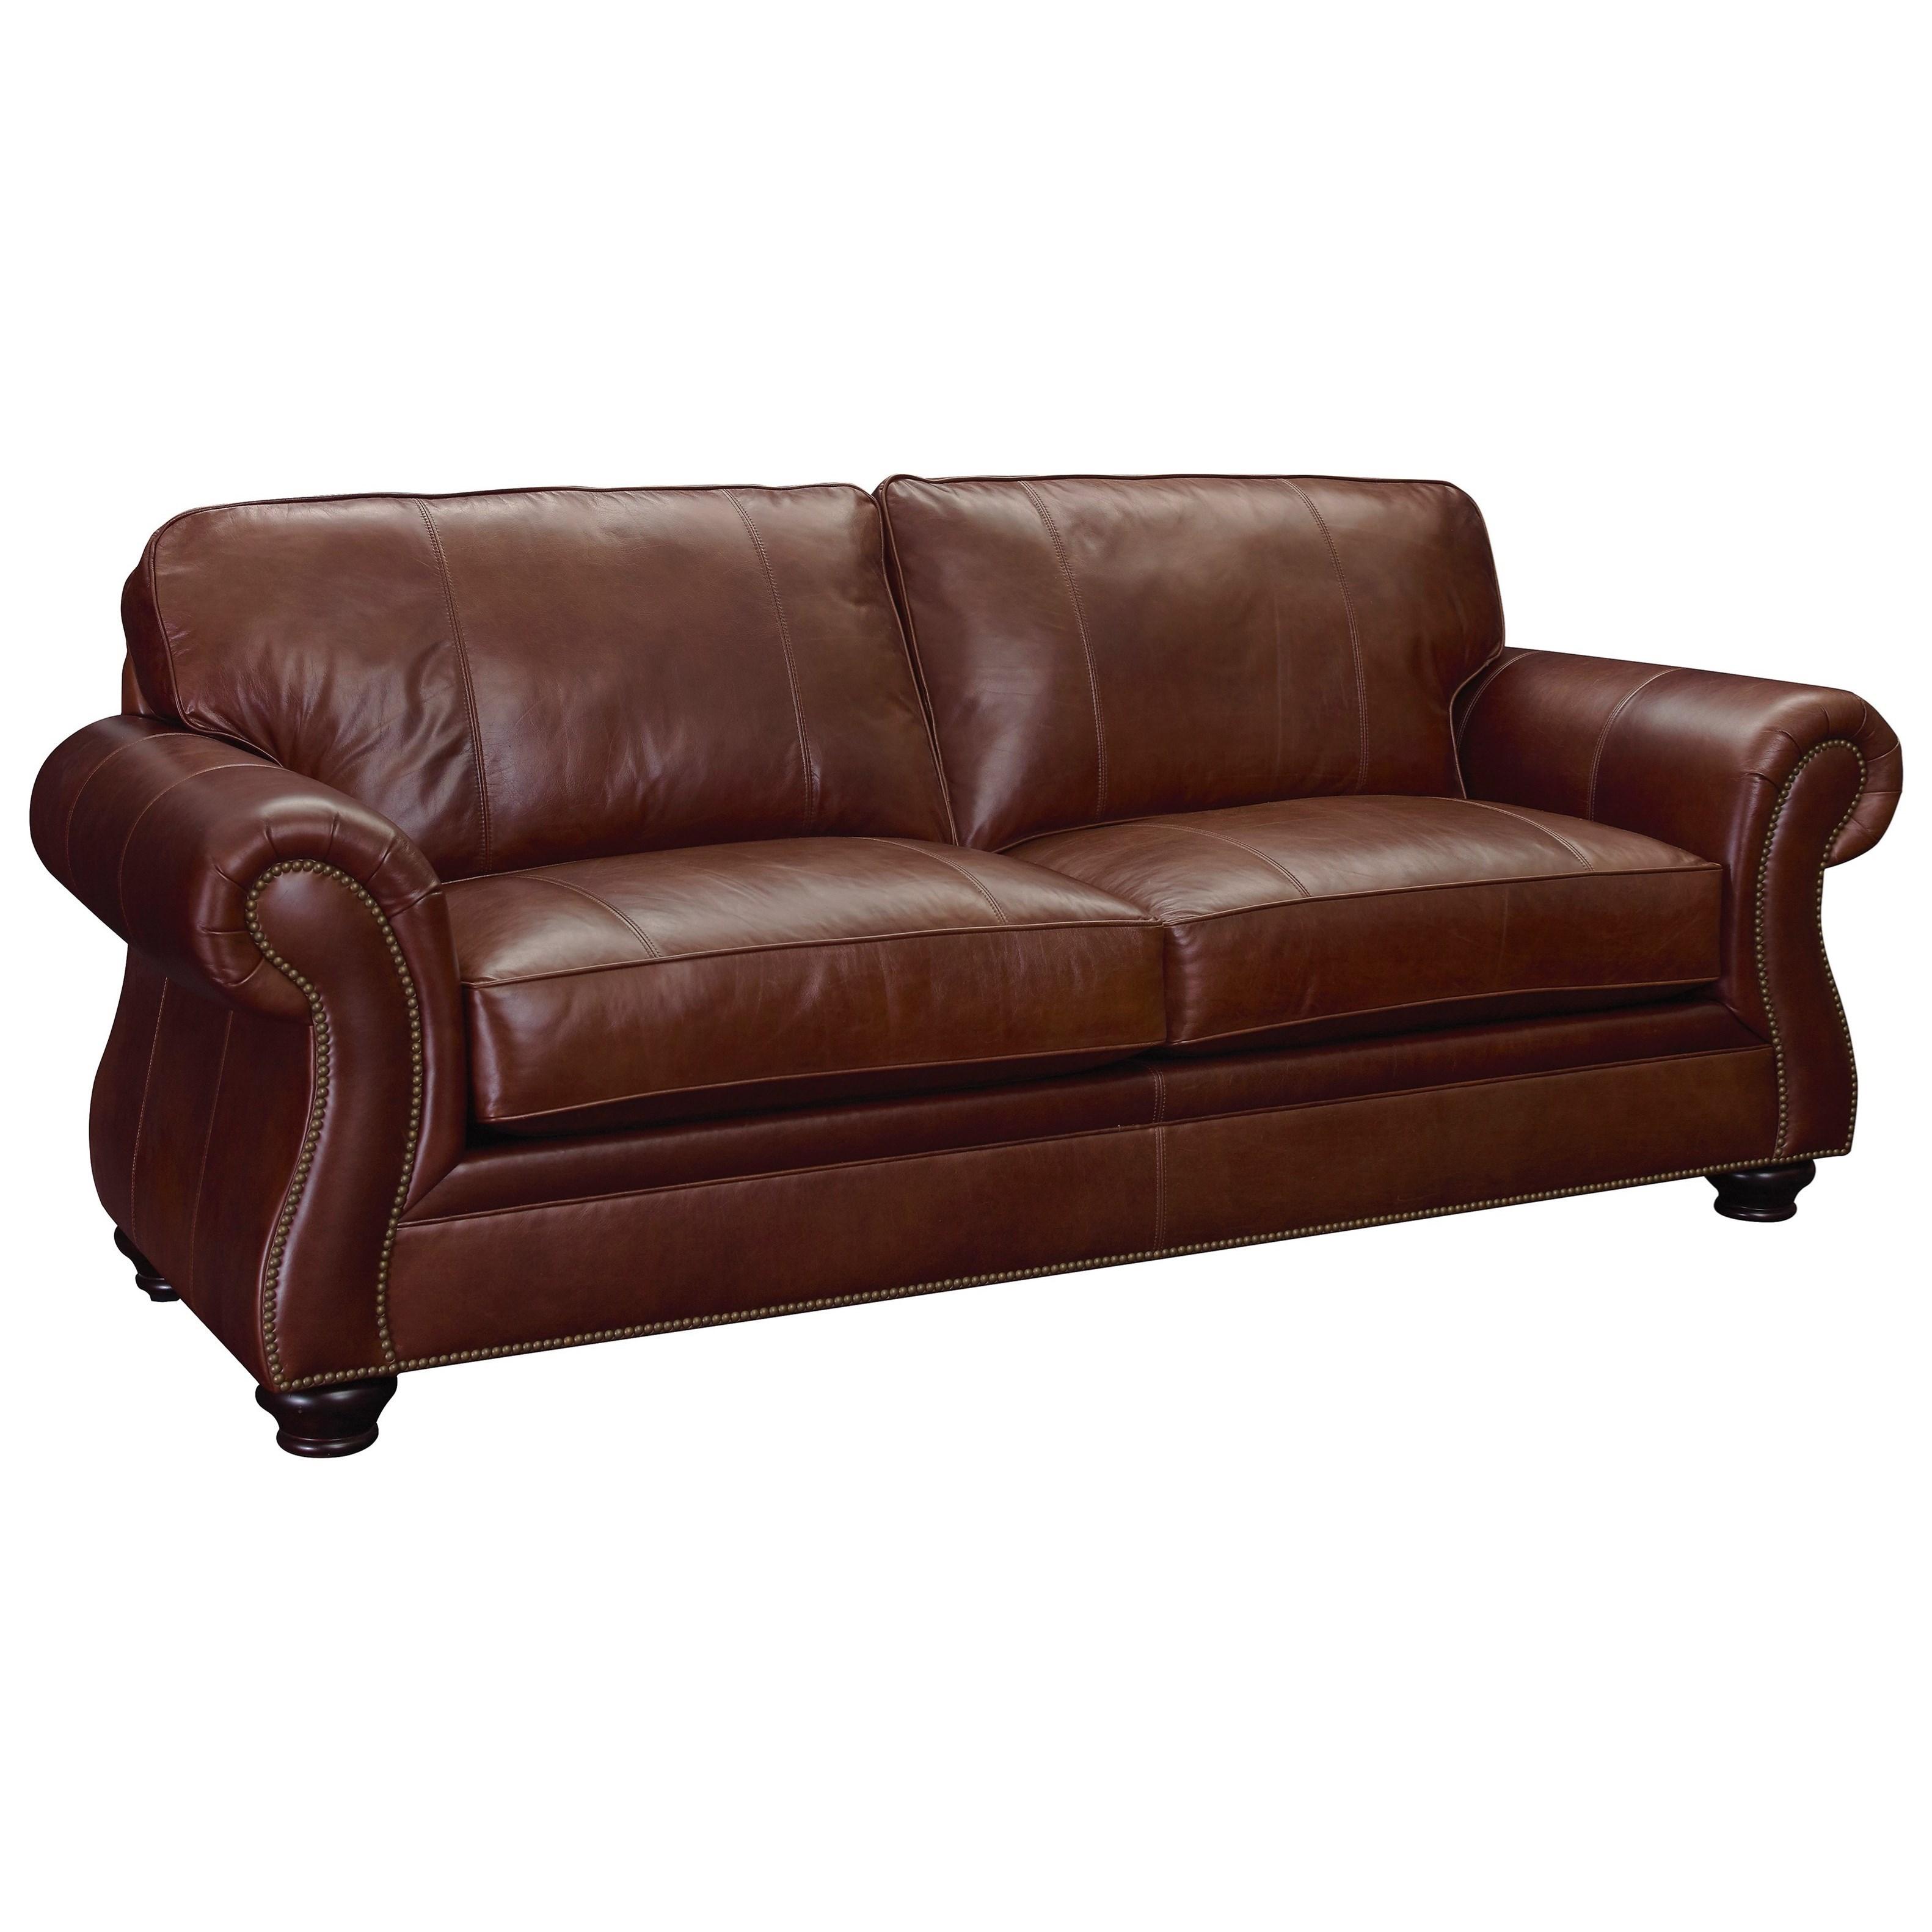 Broyhill furniture laramie air dream sofa sleeper with for Sofa dreams